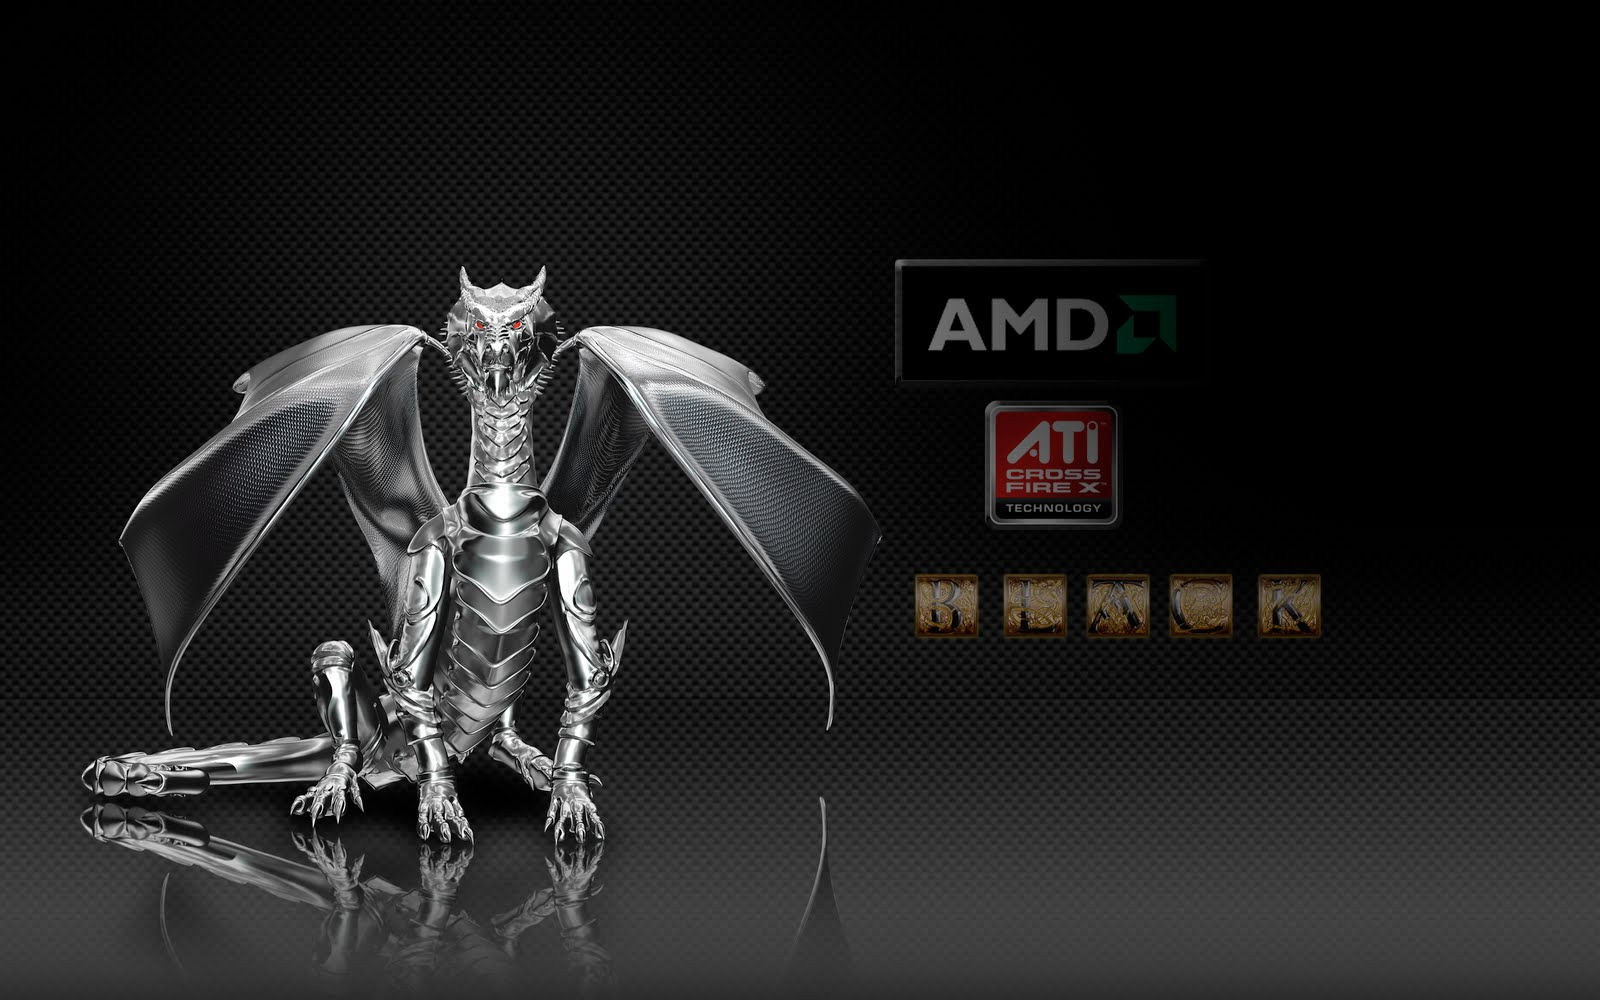 http://3.bp.blogspot.com/_2UbsSBz9ckE/S2ntdQV2RoI/AAAAAAAAAv4/LRepN_5AK7o/s1600/AMD_dragon_2_series_fusion_hd_wallpaper.jpg